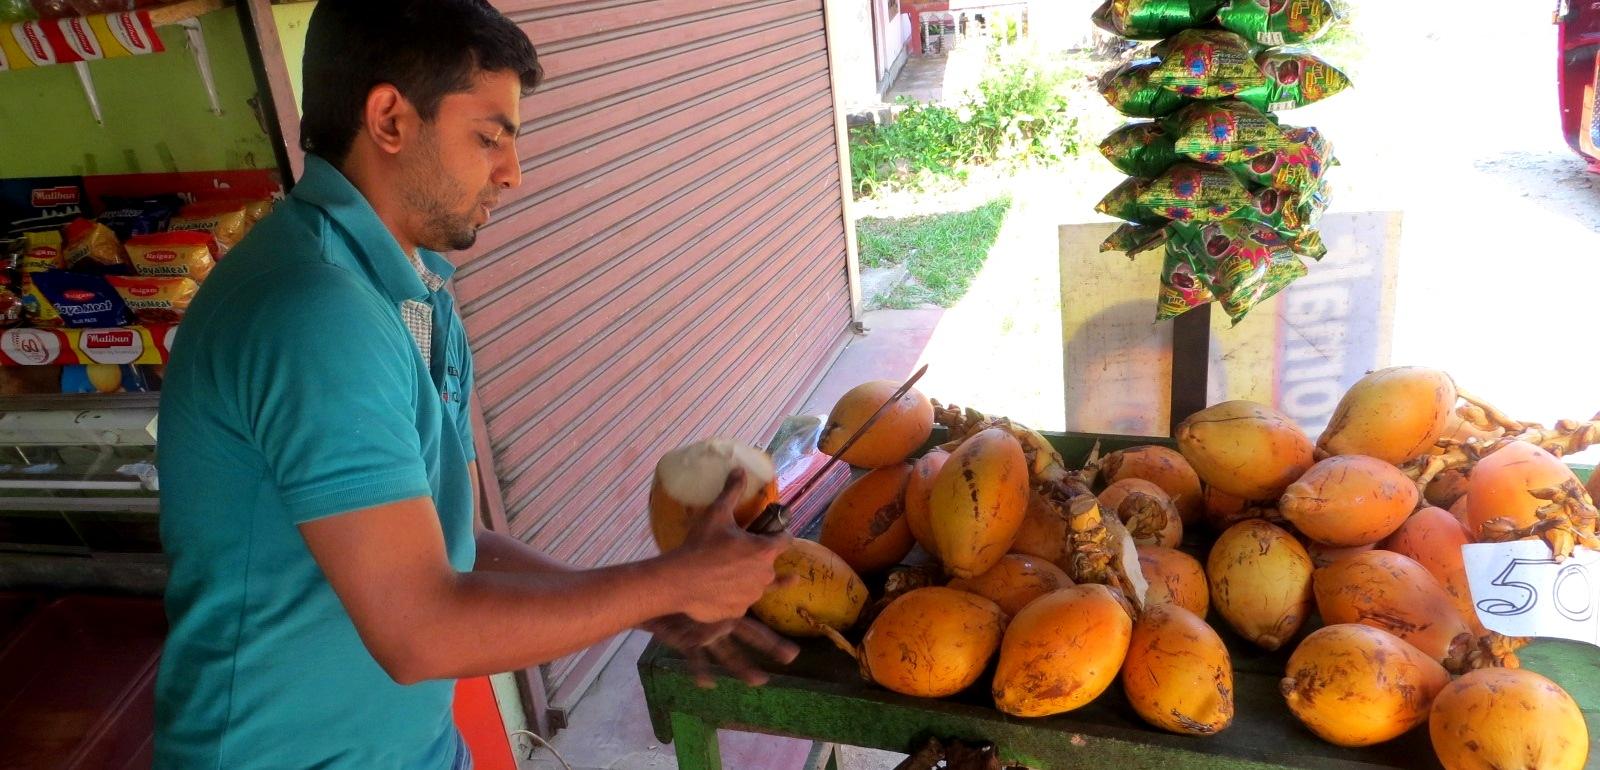 king-coconut-koenigskokosnuss-sri-lanka-kandy